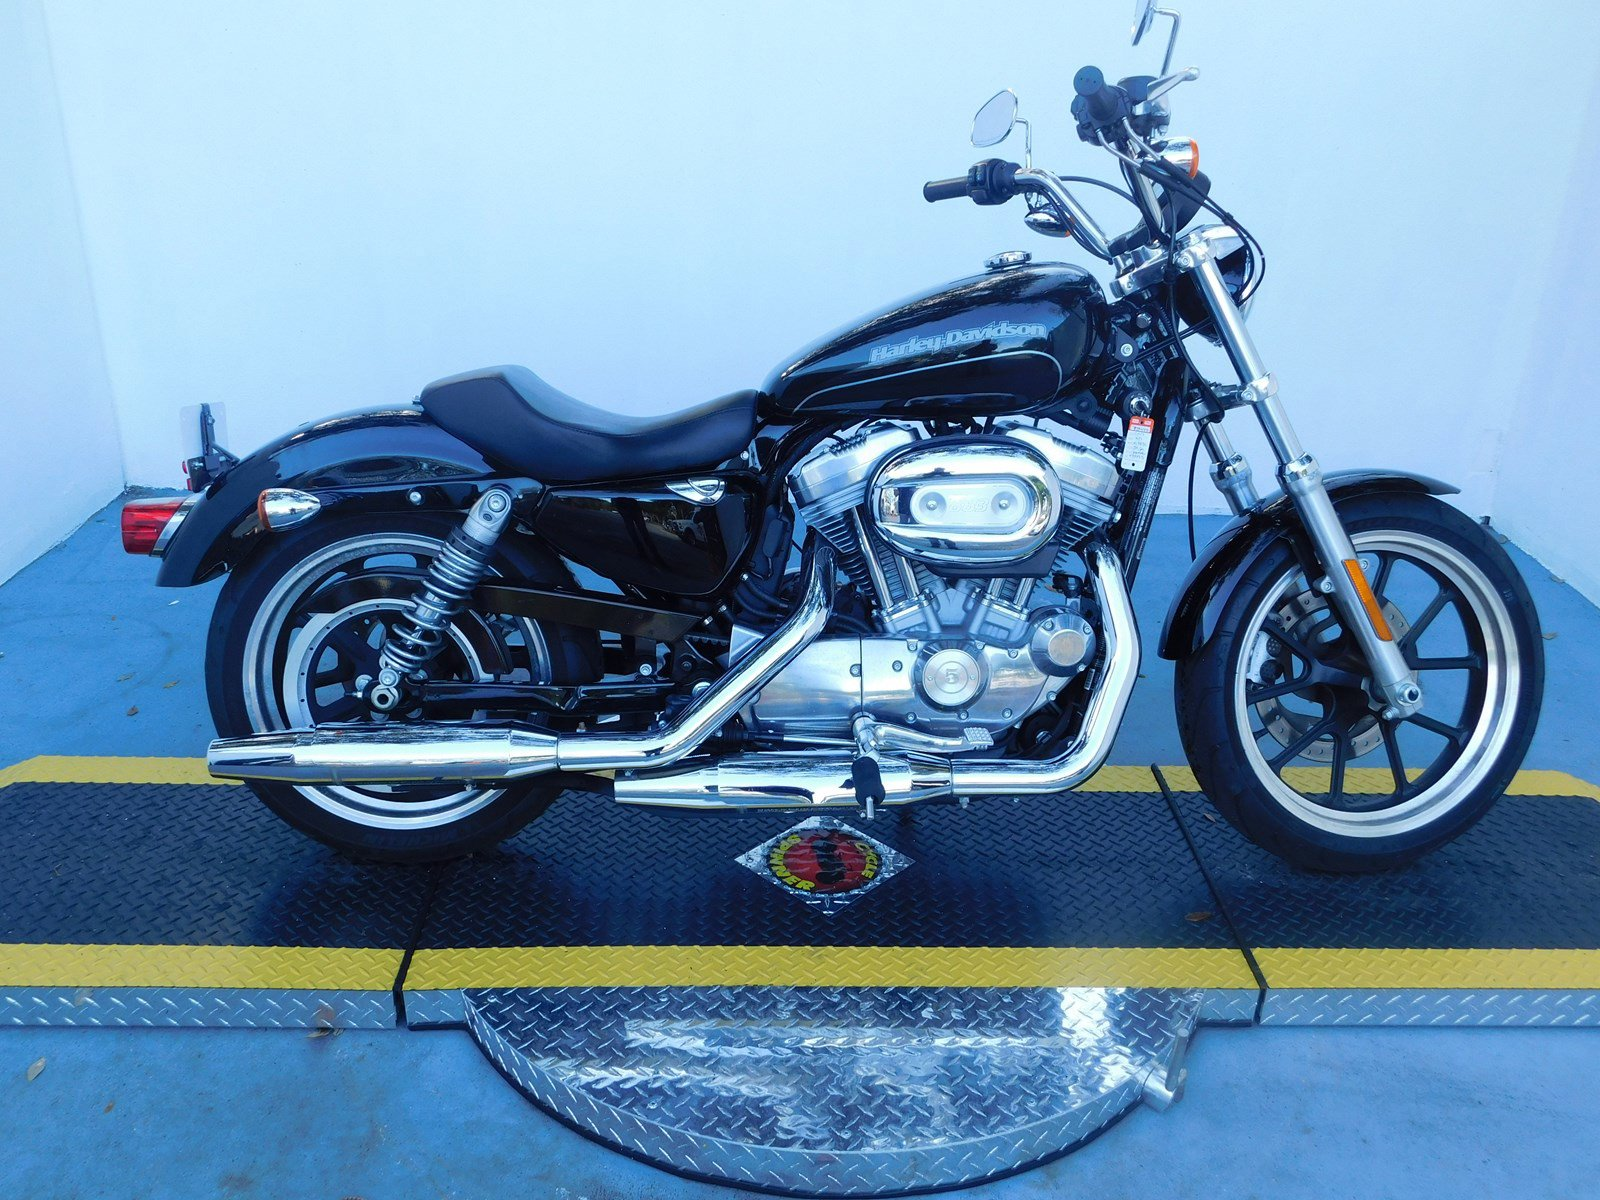 Pre-Owned 2017 Harley-Davidson Sportster 883 Superlow XL883L